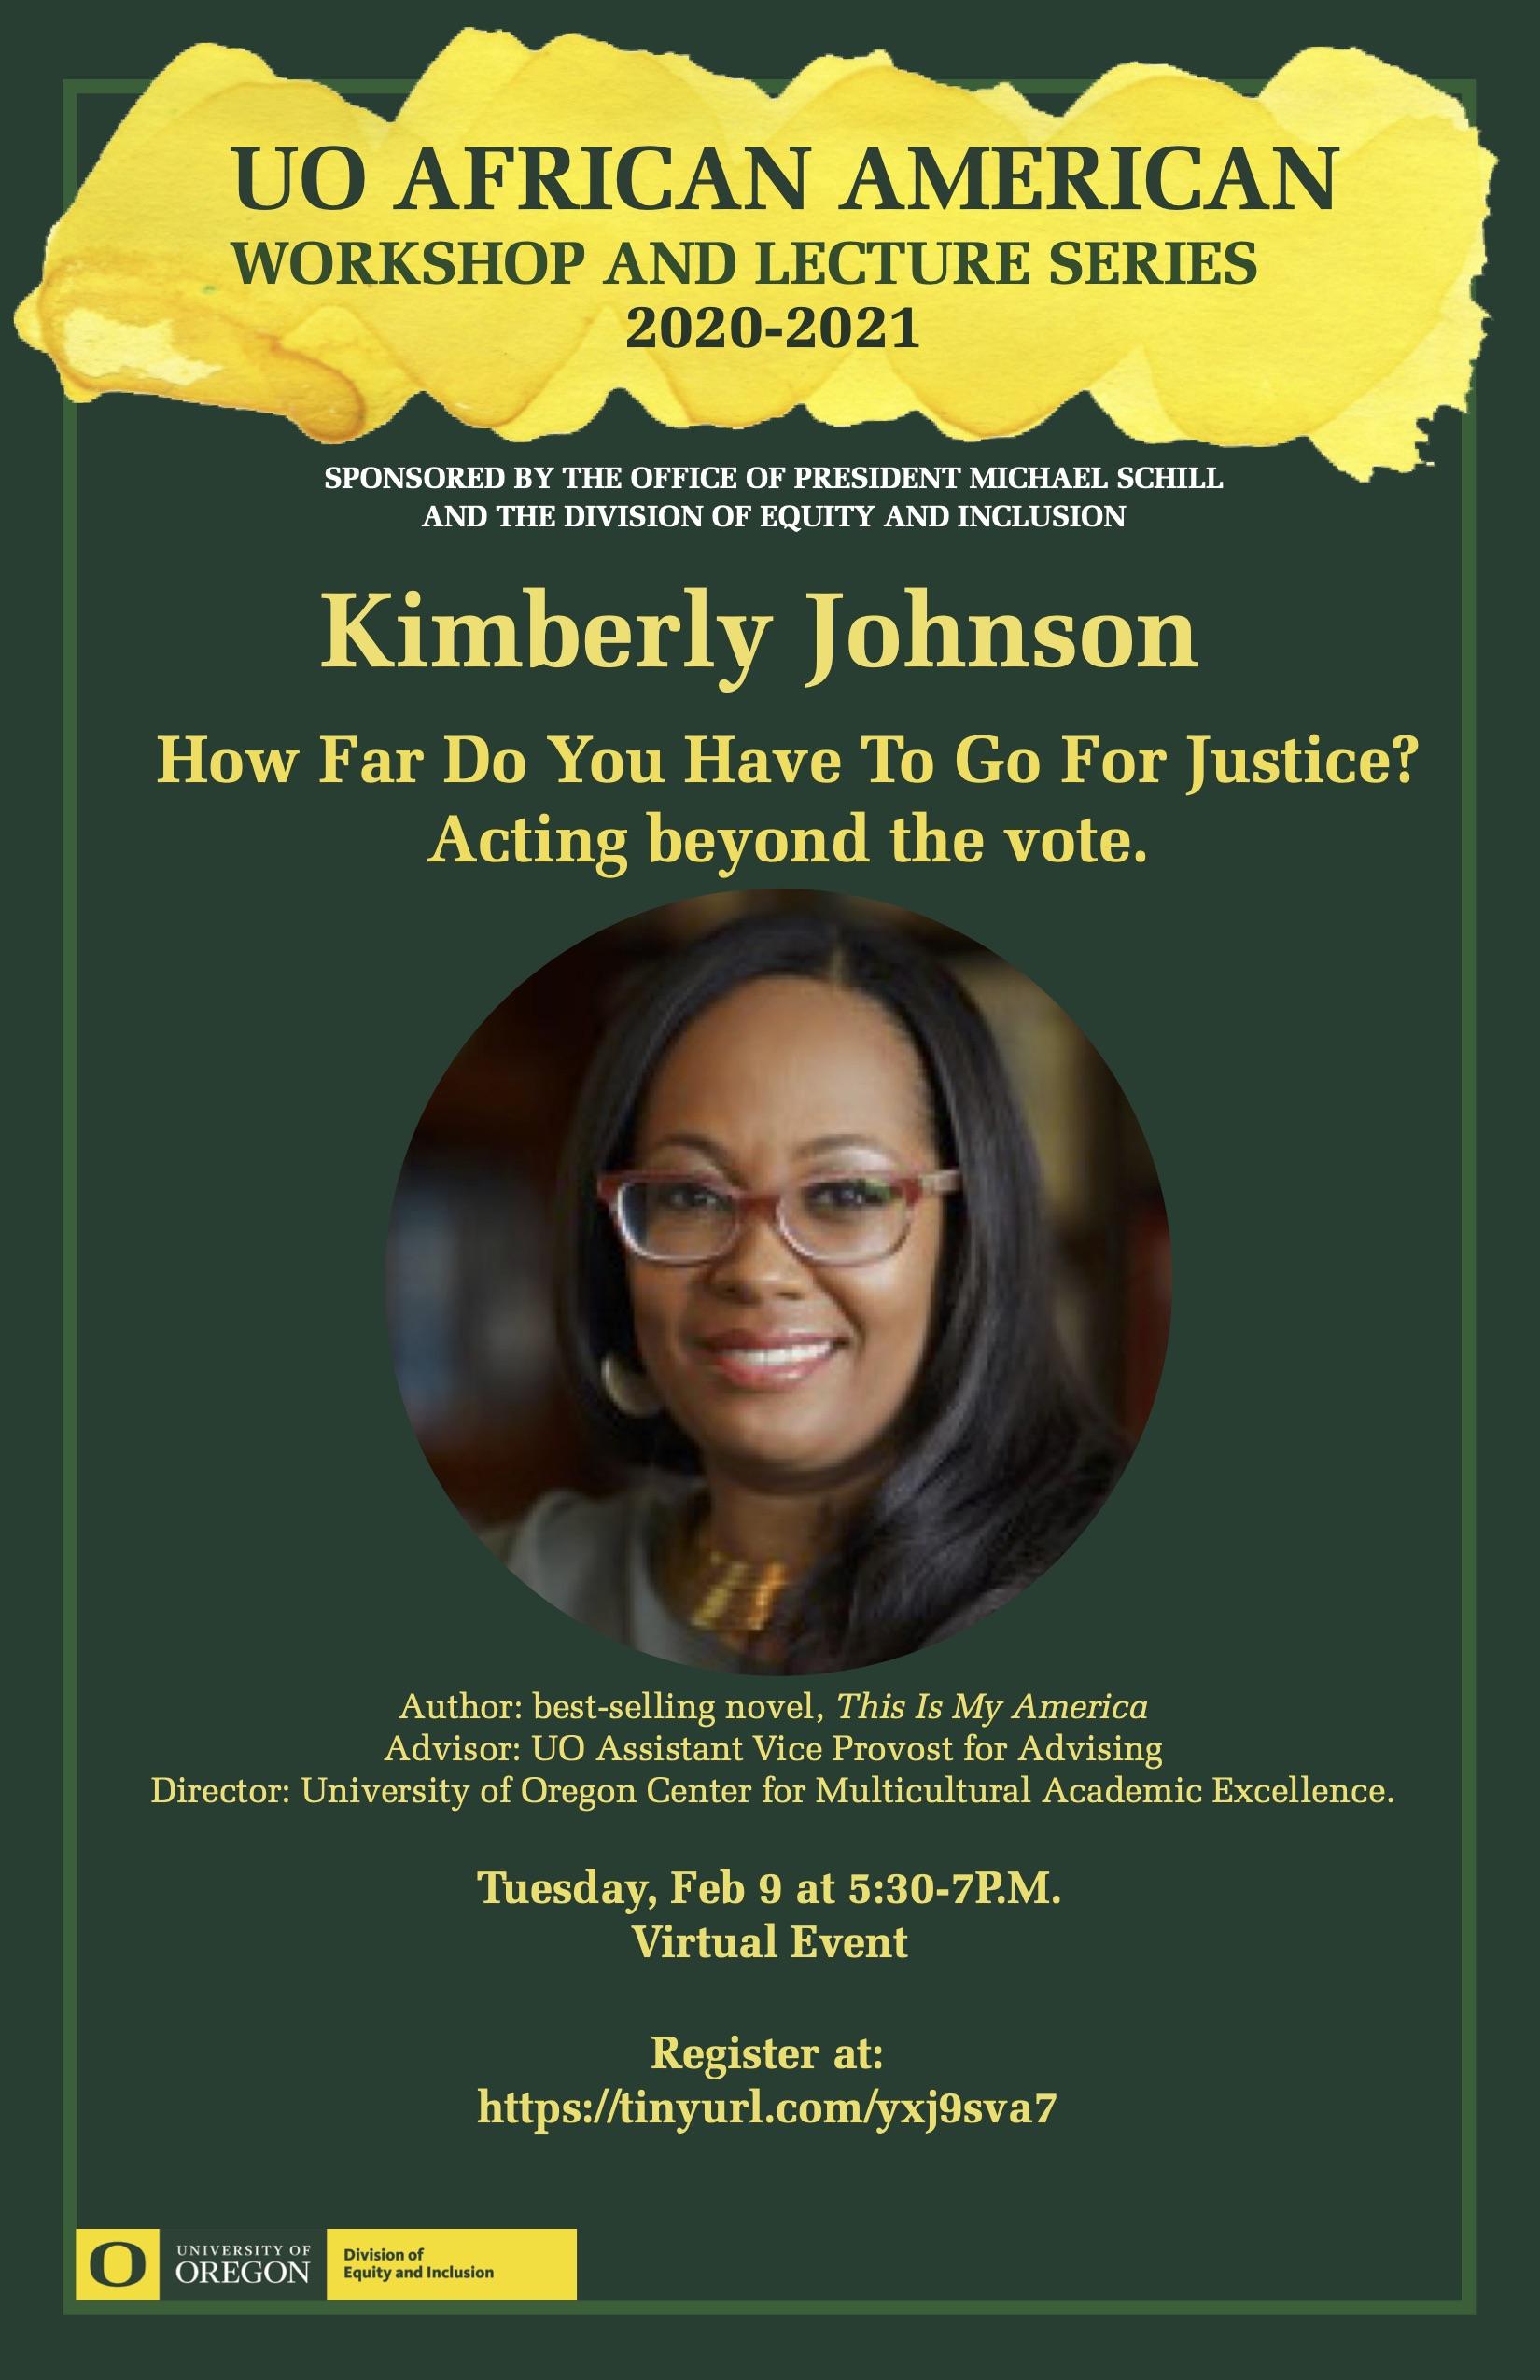 Tuesday, Feb 9 at 5:30-7P.M. Virtual Event